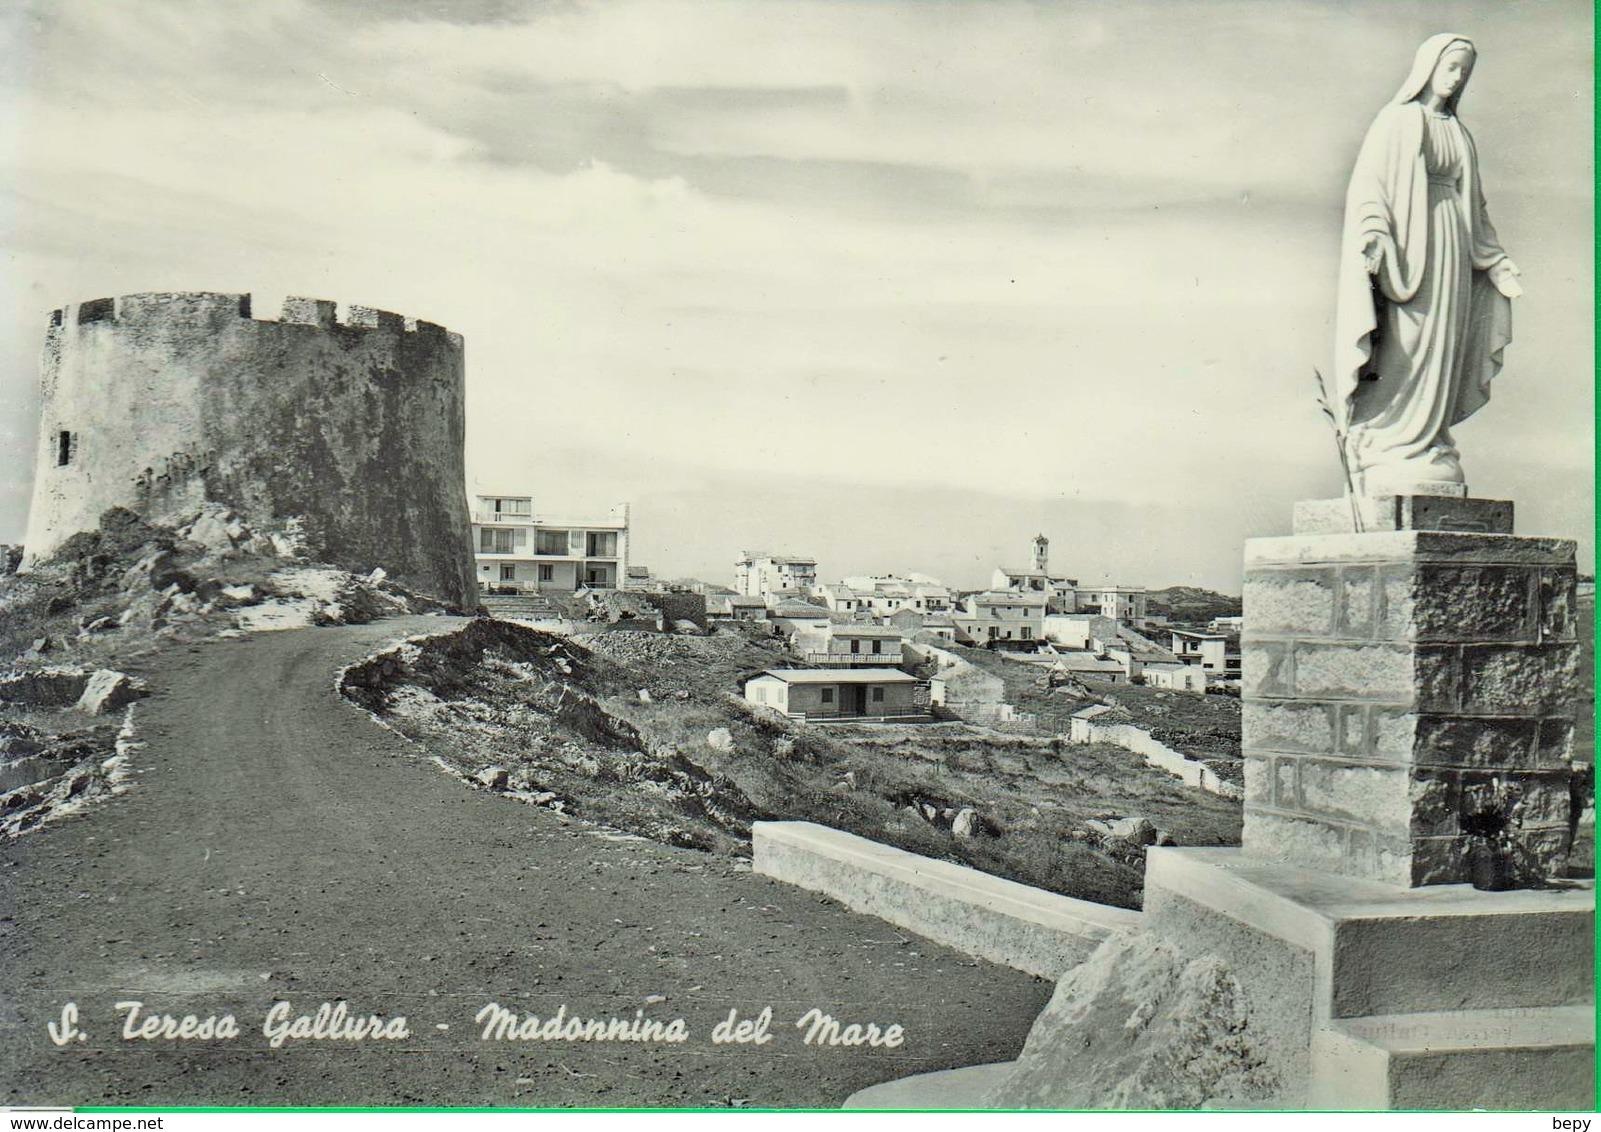 SANTA TERESA DI GALLURA, Olbia. Tempio Pausanio. Sassari. 19a - Olbia